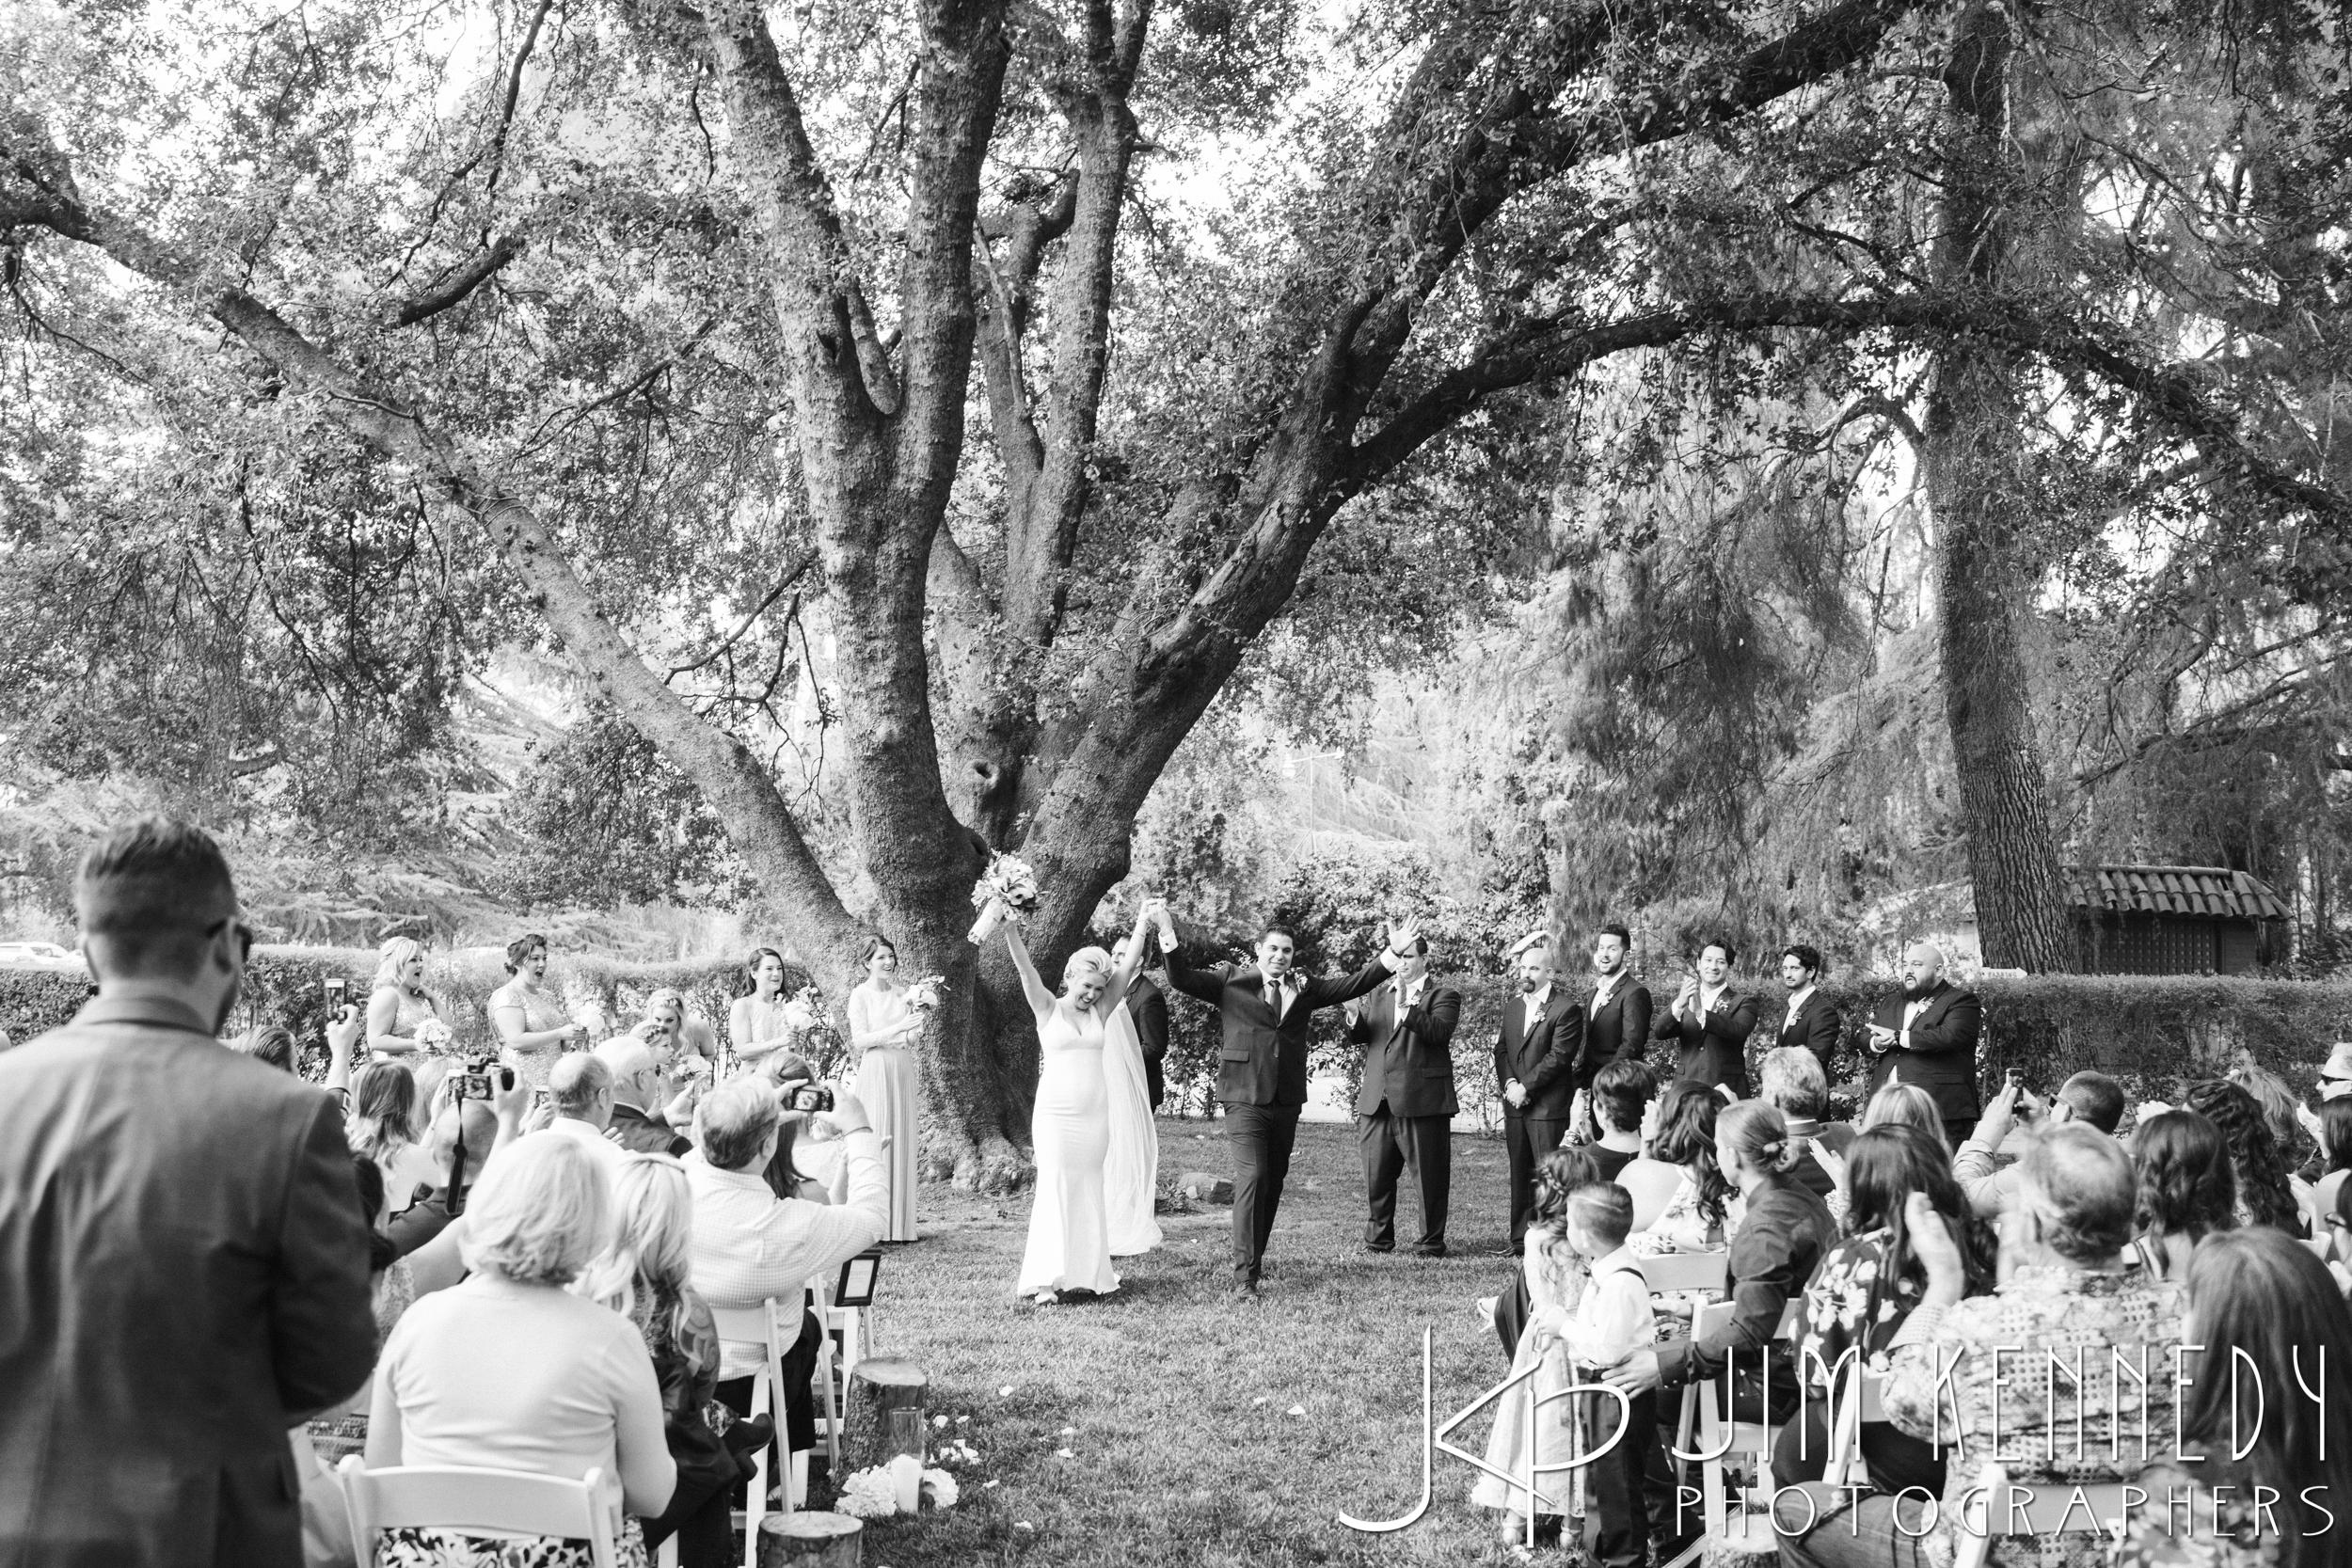 jim_kennedy_photographers_highland_springs_wedding_caitlyn_0123.jpg